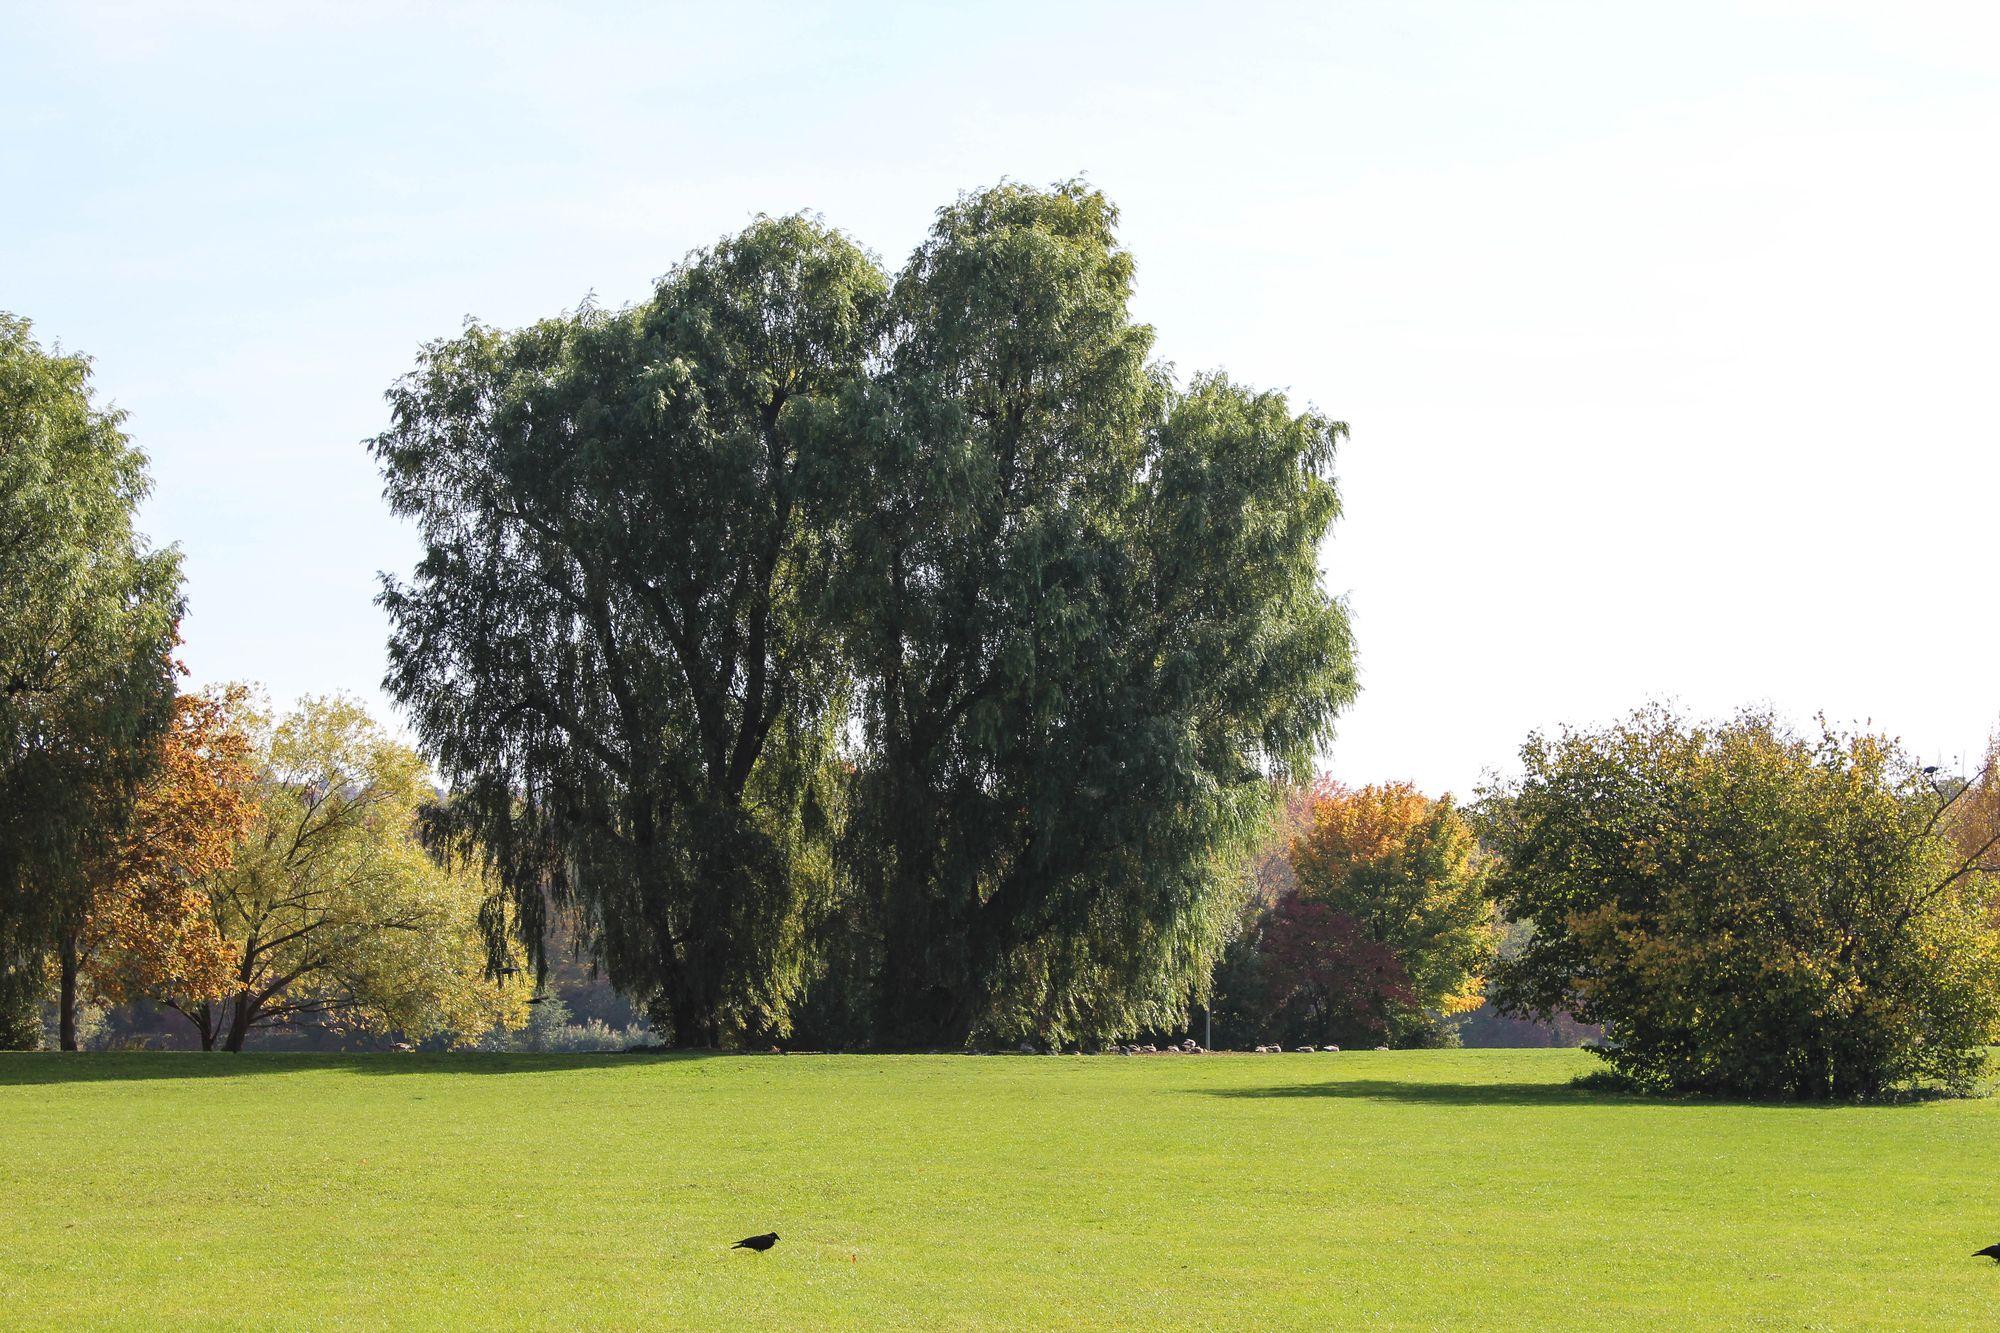 Max-Eyth-See Herbst Impressionen